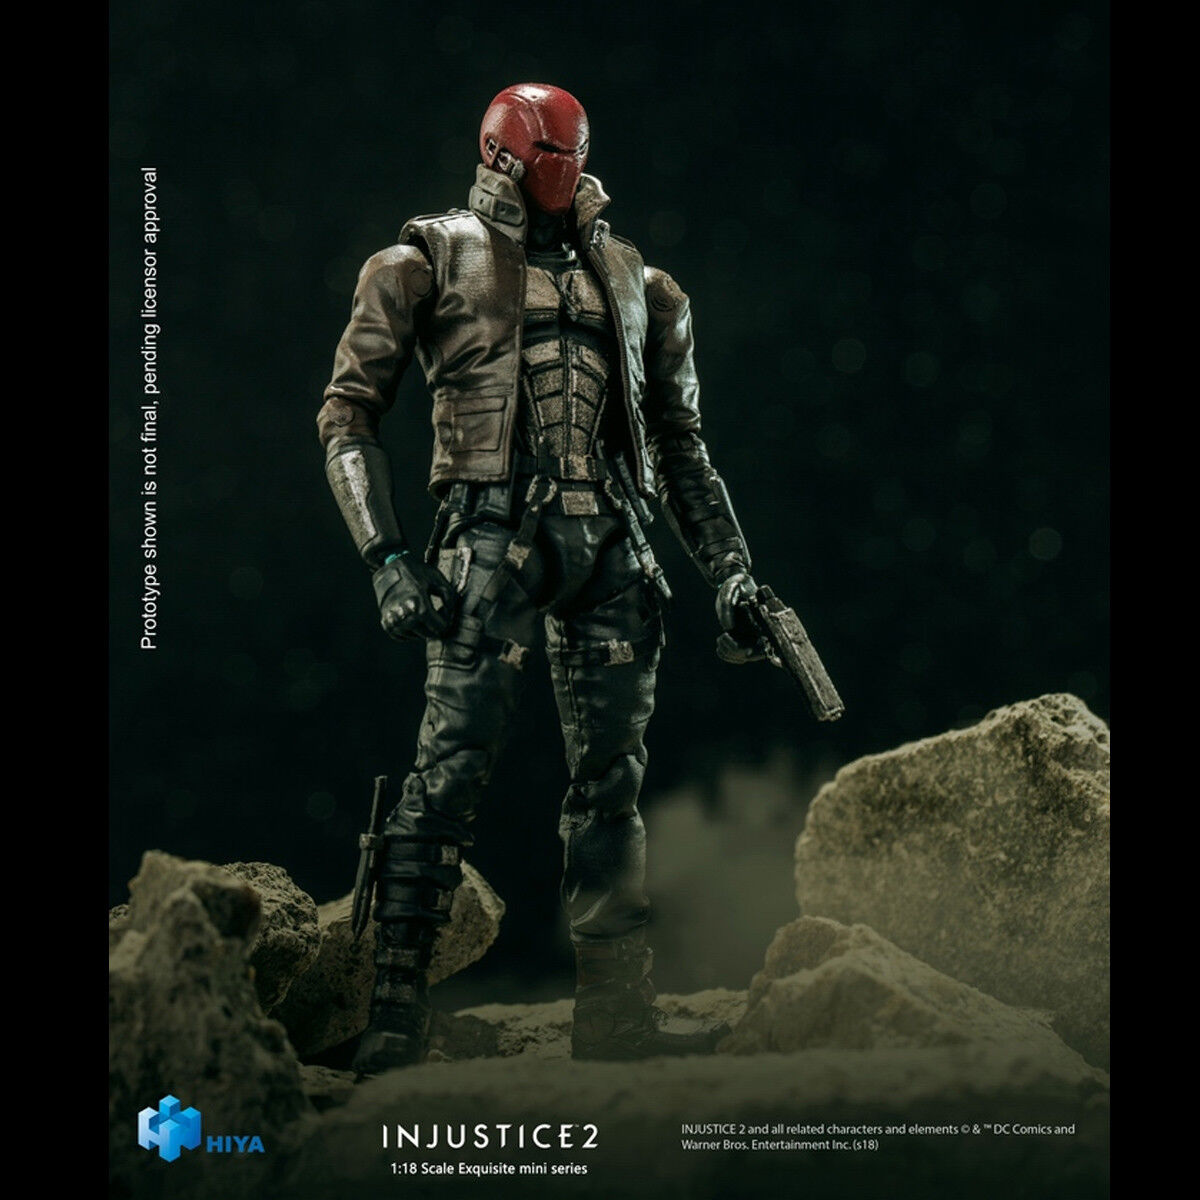 HIYAToys LD0033 1 18 Scale Injustice 2 Basic Red Hood Figure